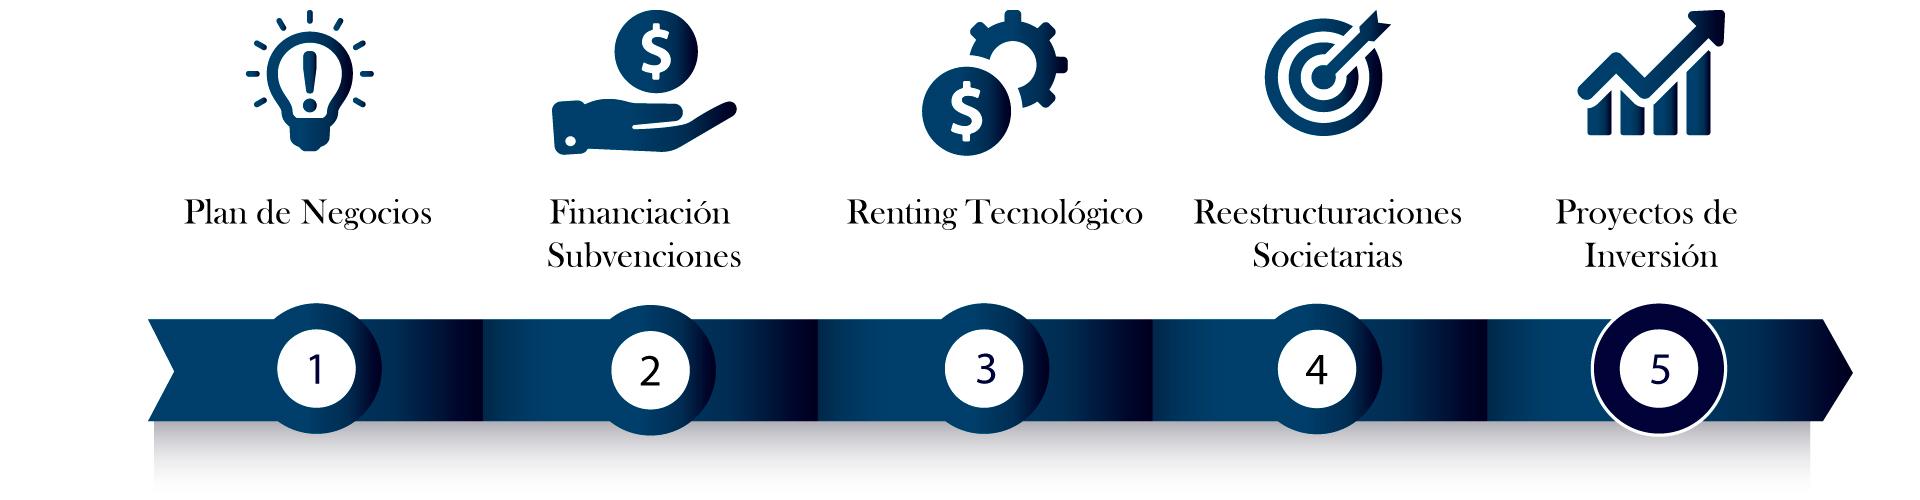 Infografia-Vertice-Asesoria-Integral-de-empresas